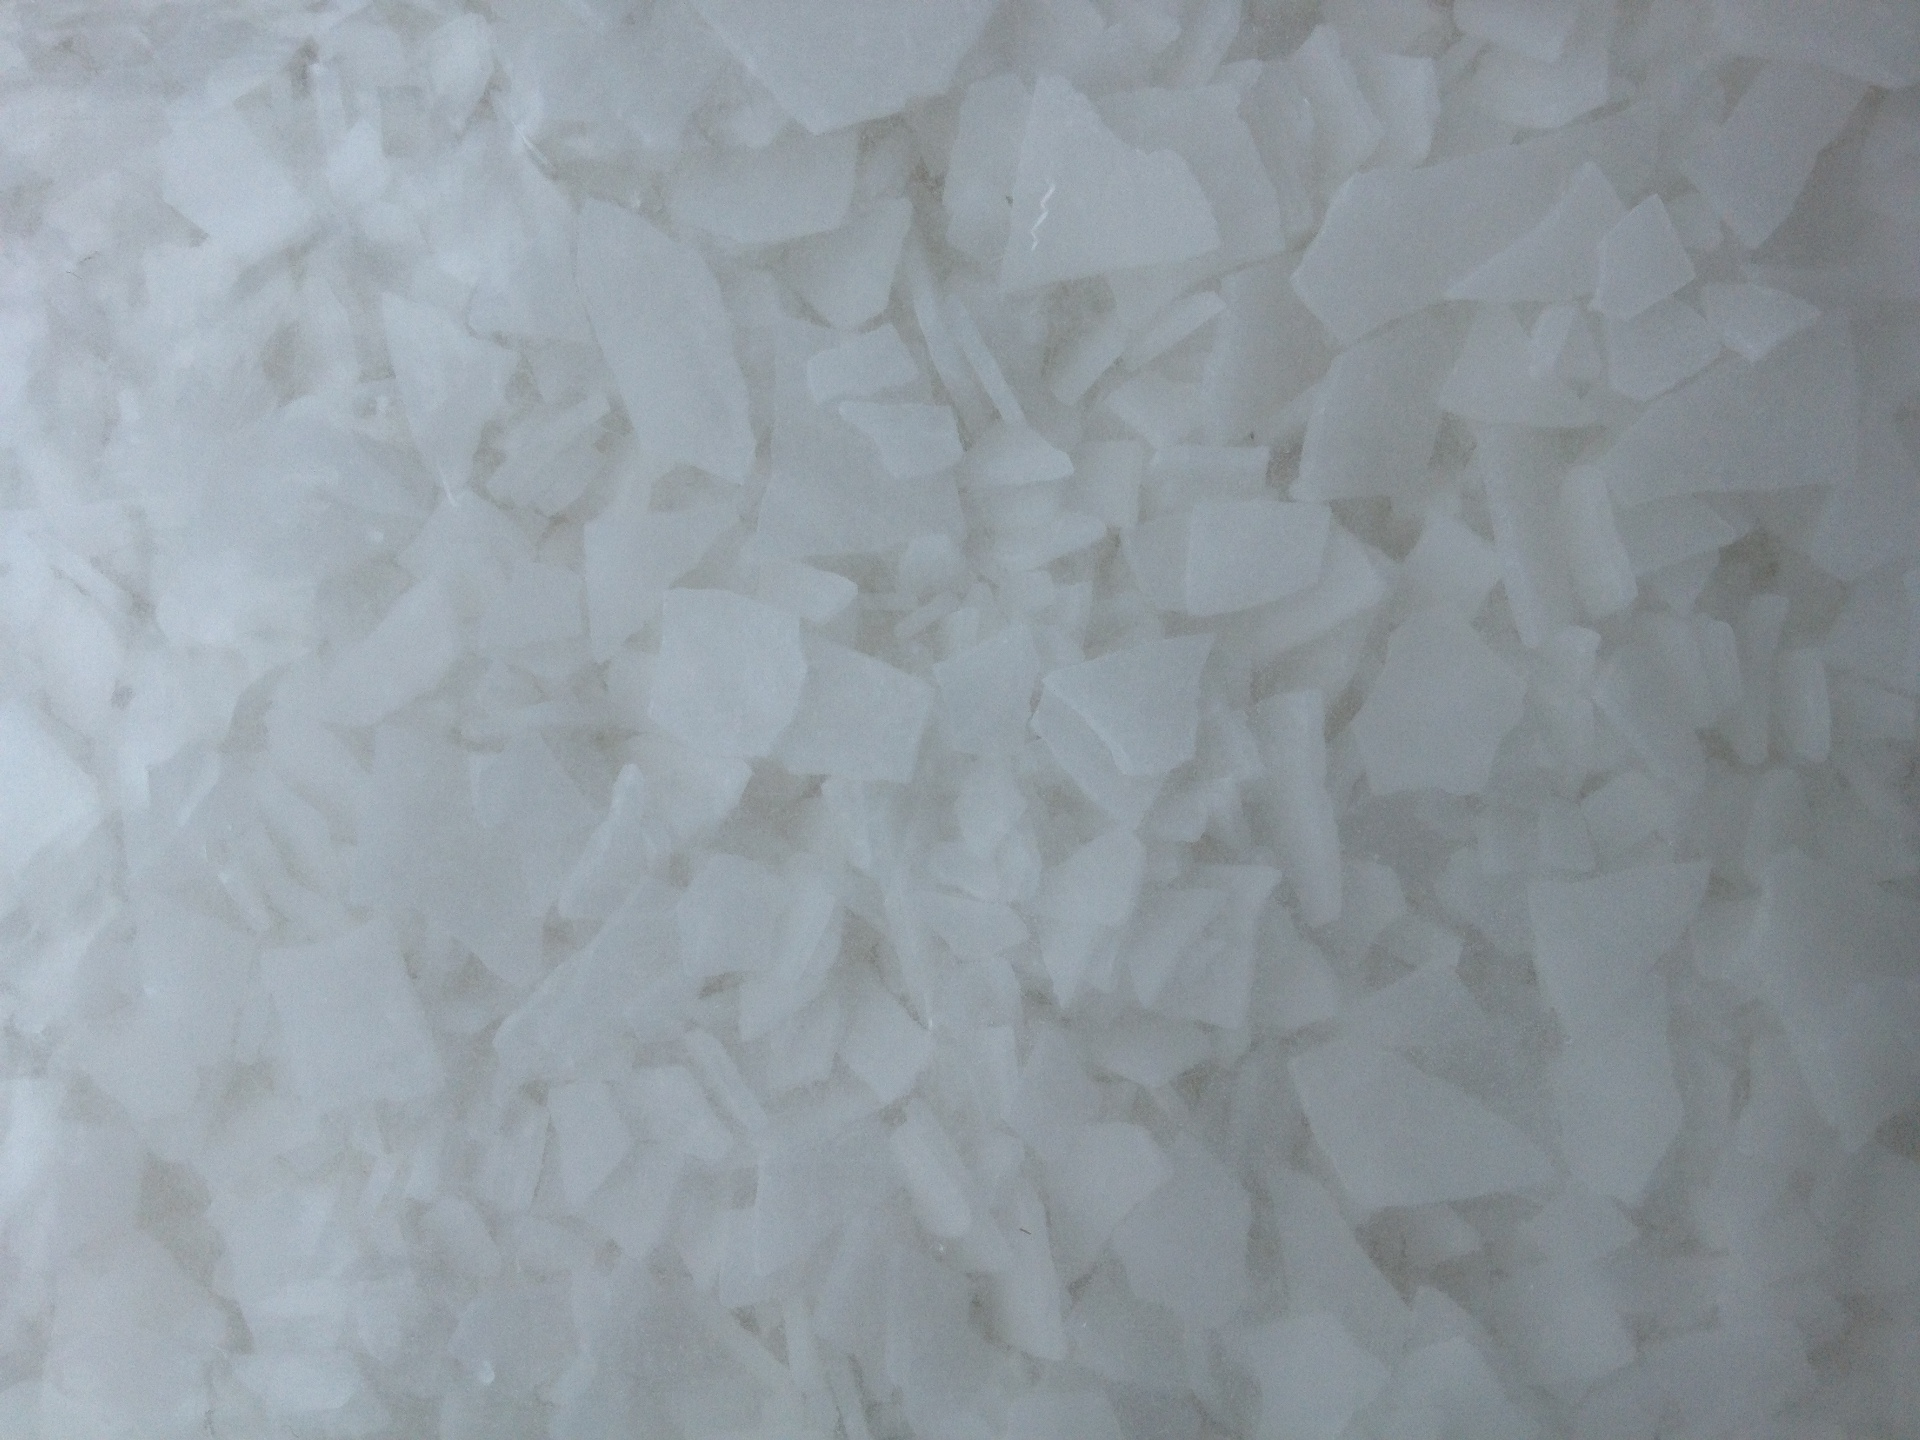 Magnesium Bade-Flocken fussbad